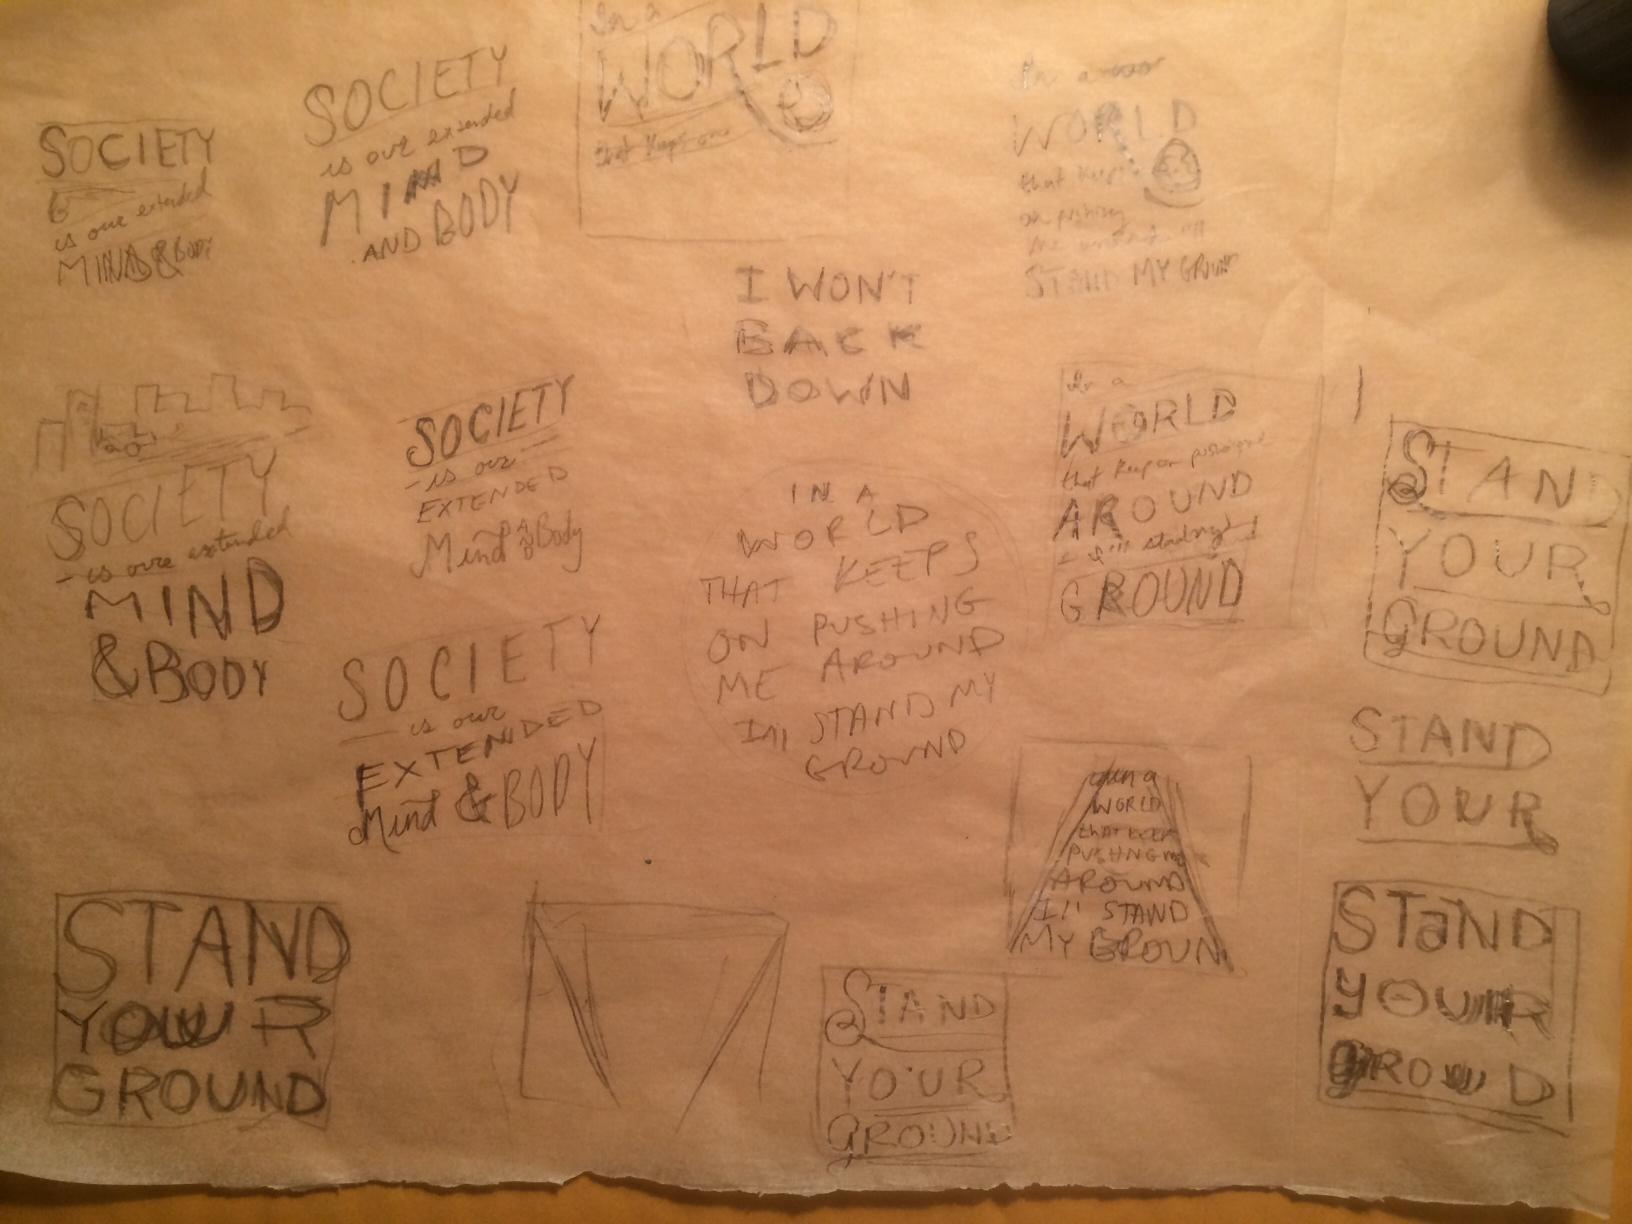 Jackson 5 / logo reinterpretation  & Tom Petty - Stand Your Ground    - image 8 - student project